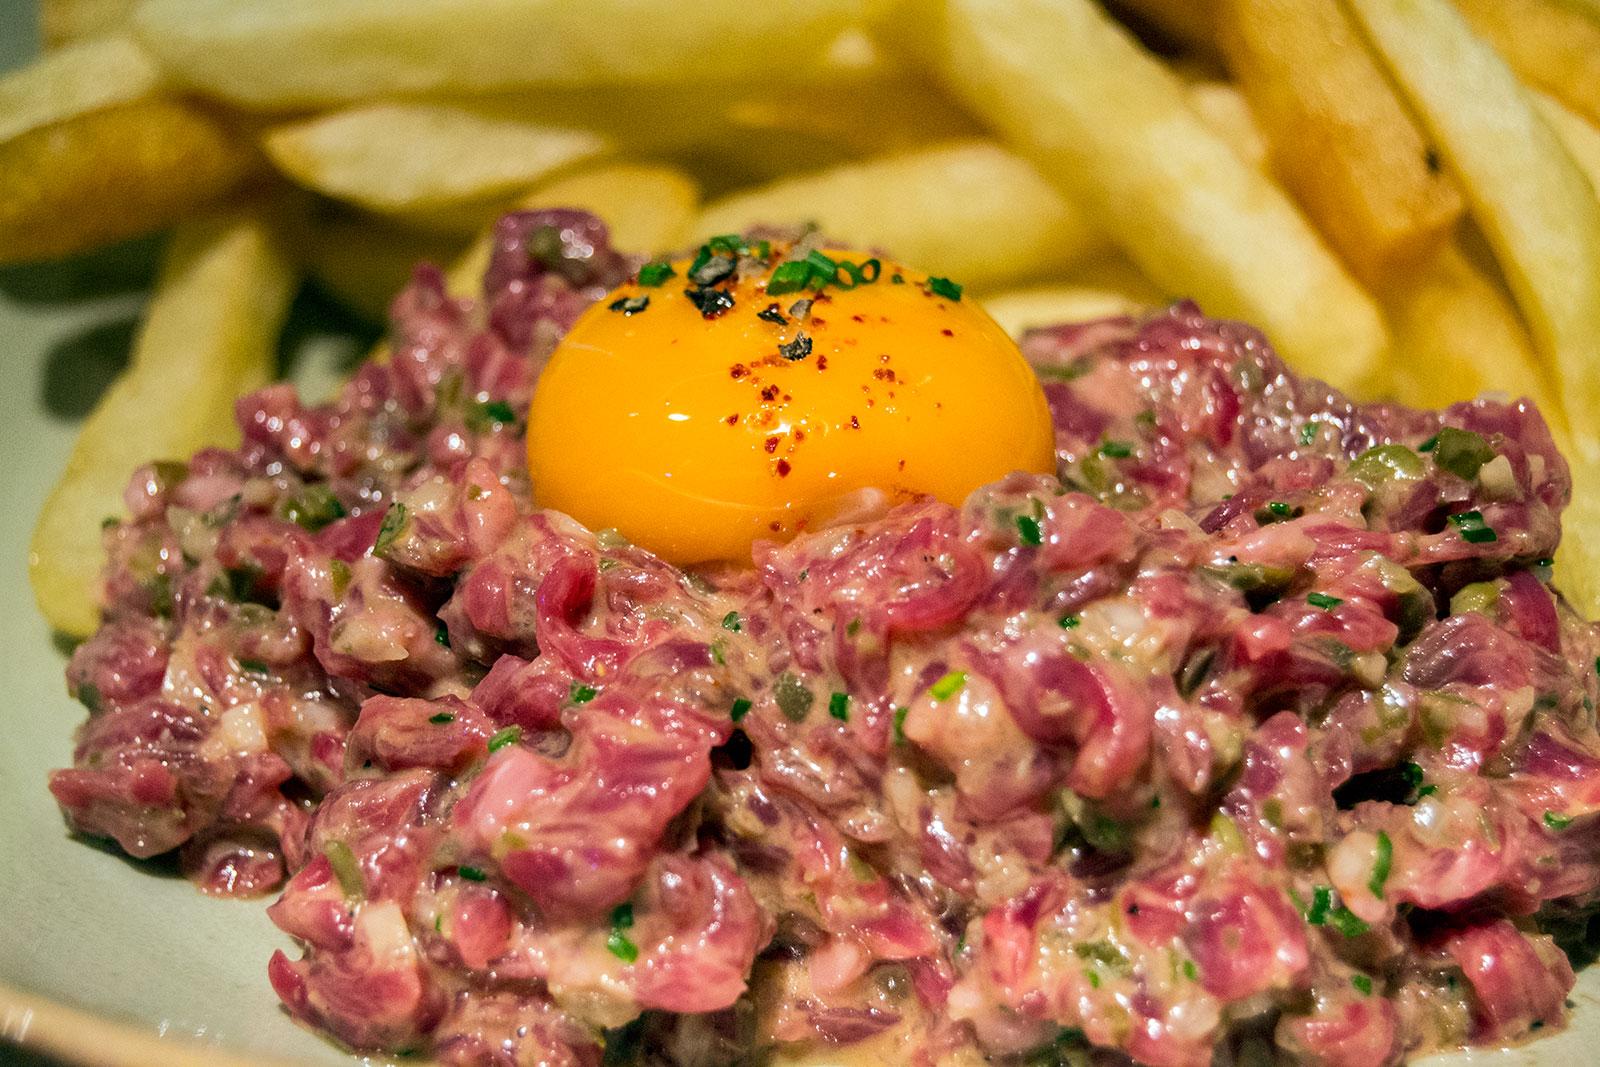 Steak tartar con patatas fritas - Lamadame